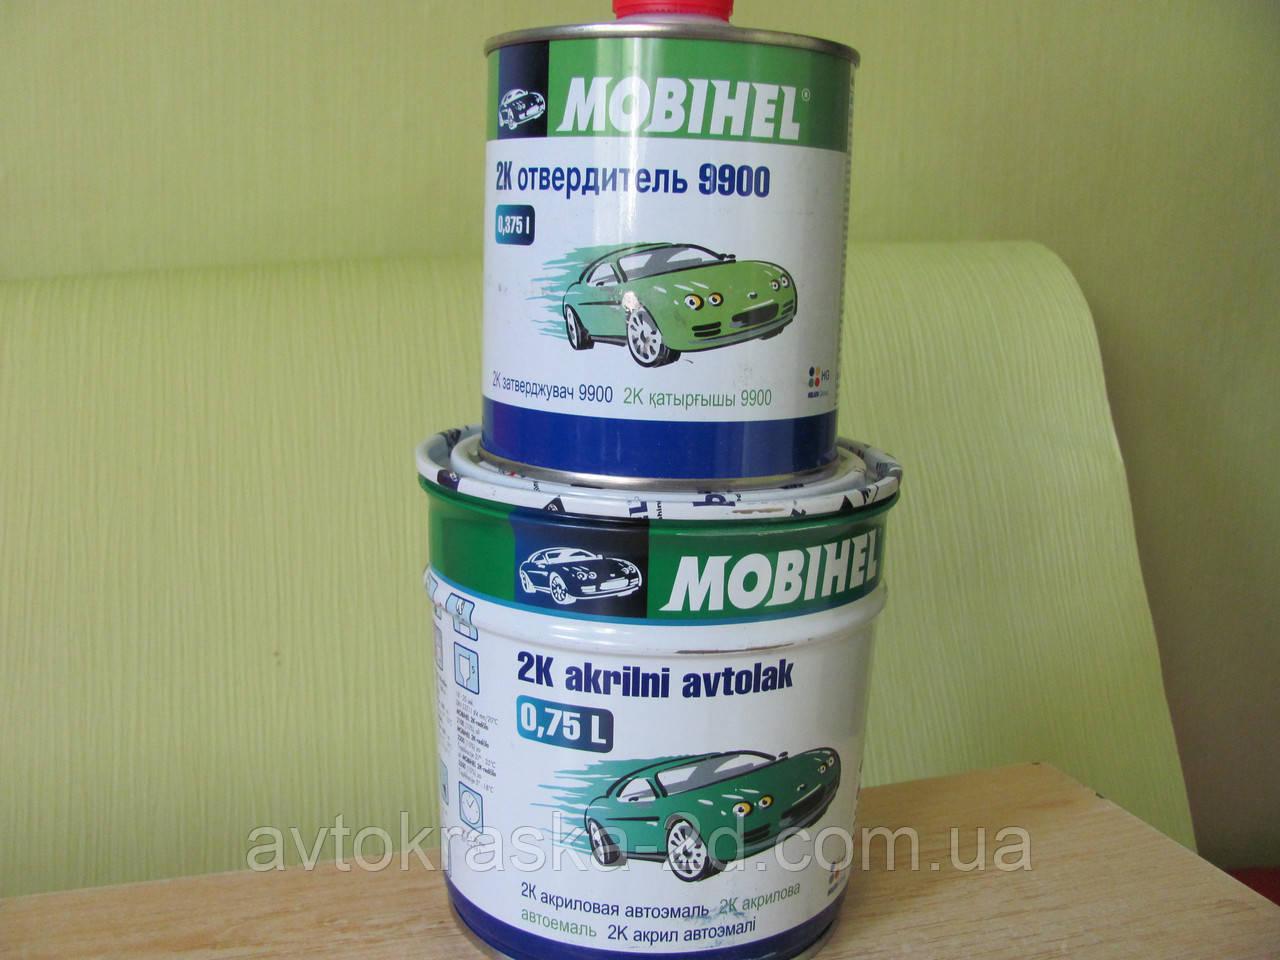 Акрилова автофарба MOBIHEL Біла № 240 (0,75 л) + затверджувач 9900 0,375 л